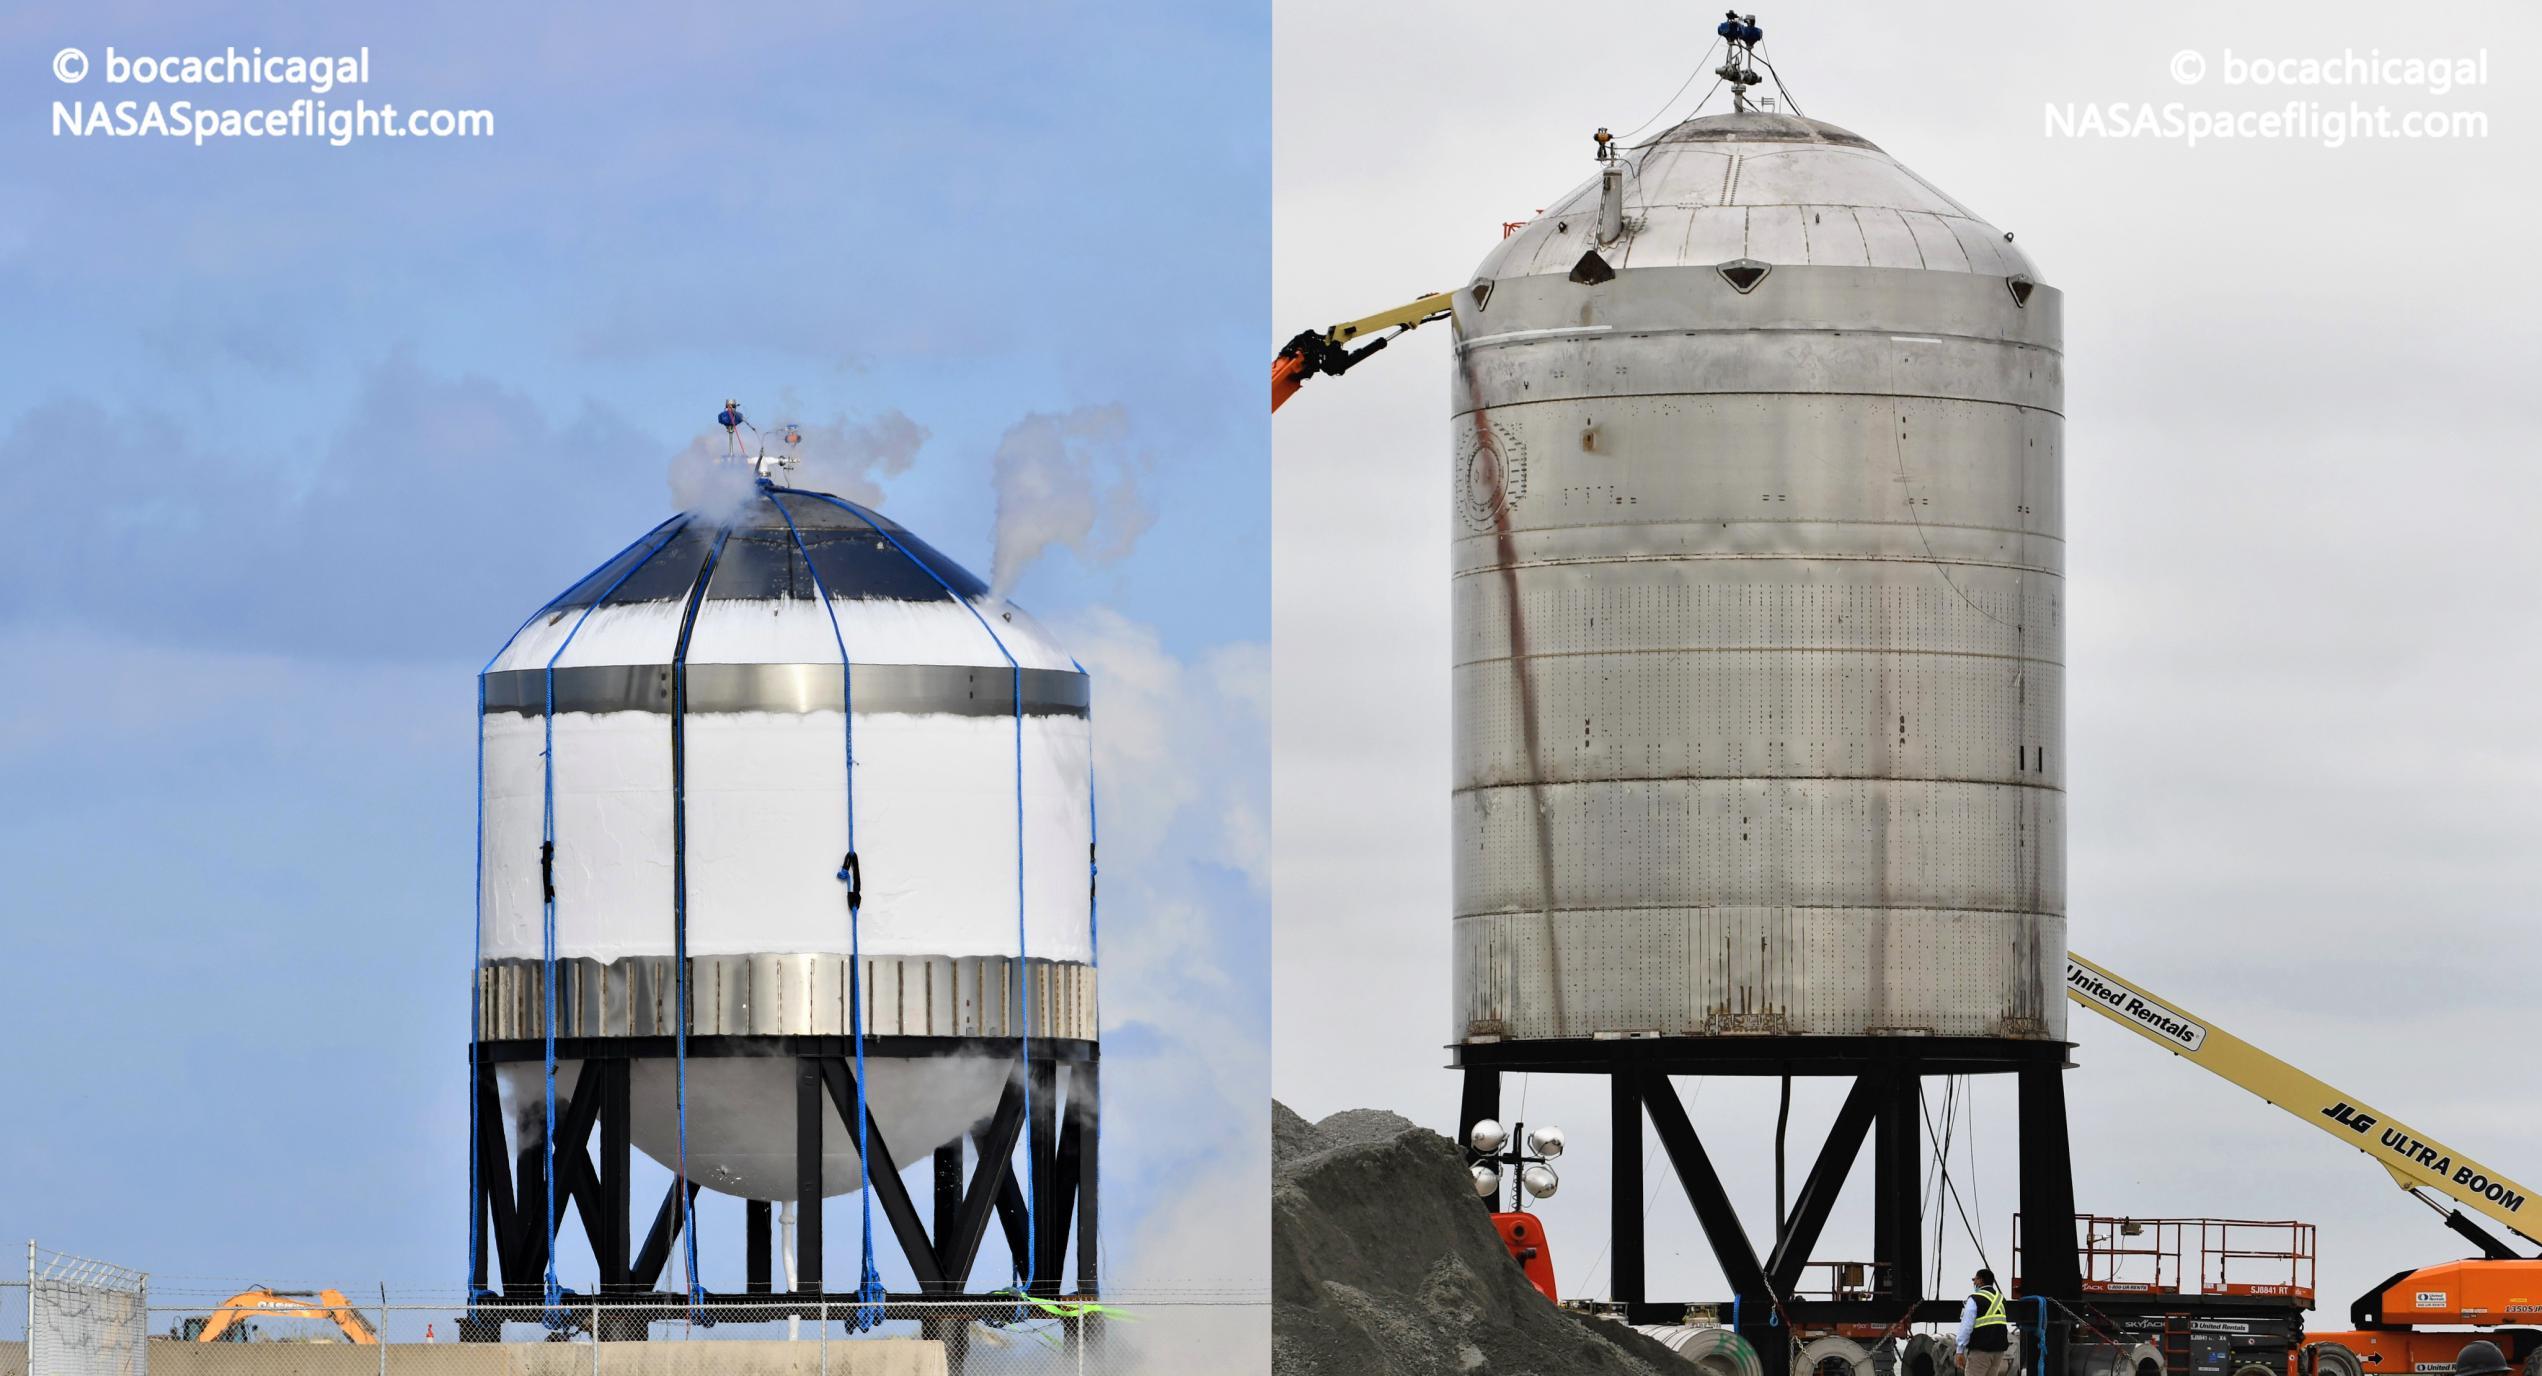 Starship SN7 vs SN7.1 061520 092120 (NASASpaceflight – bocachicagal) 1 (c)